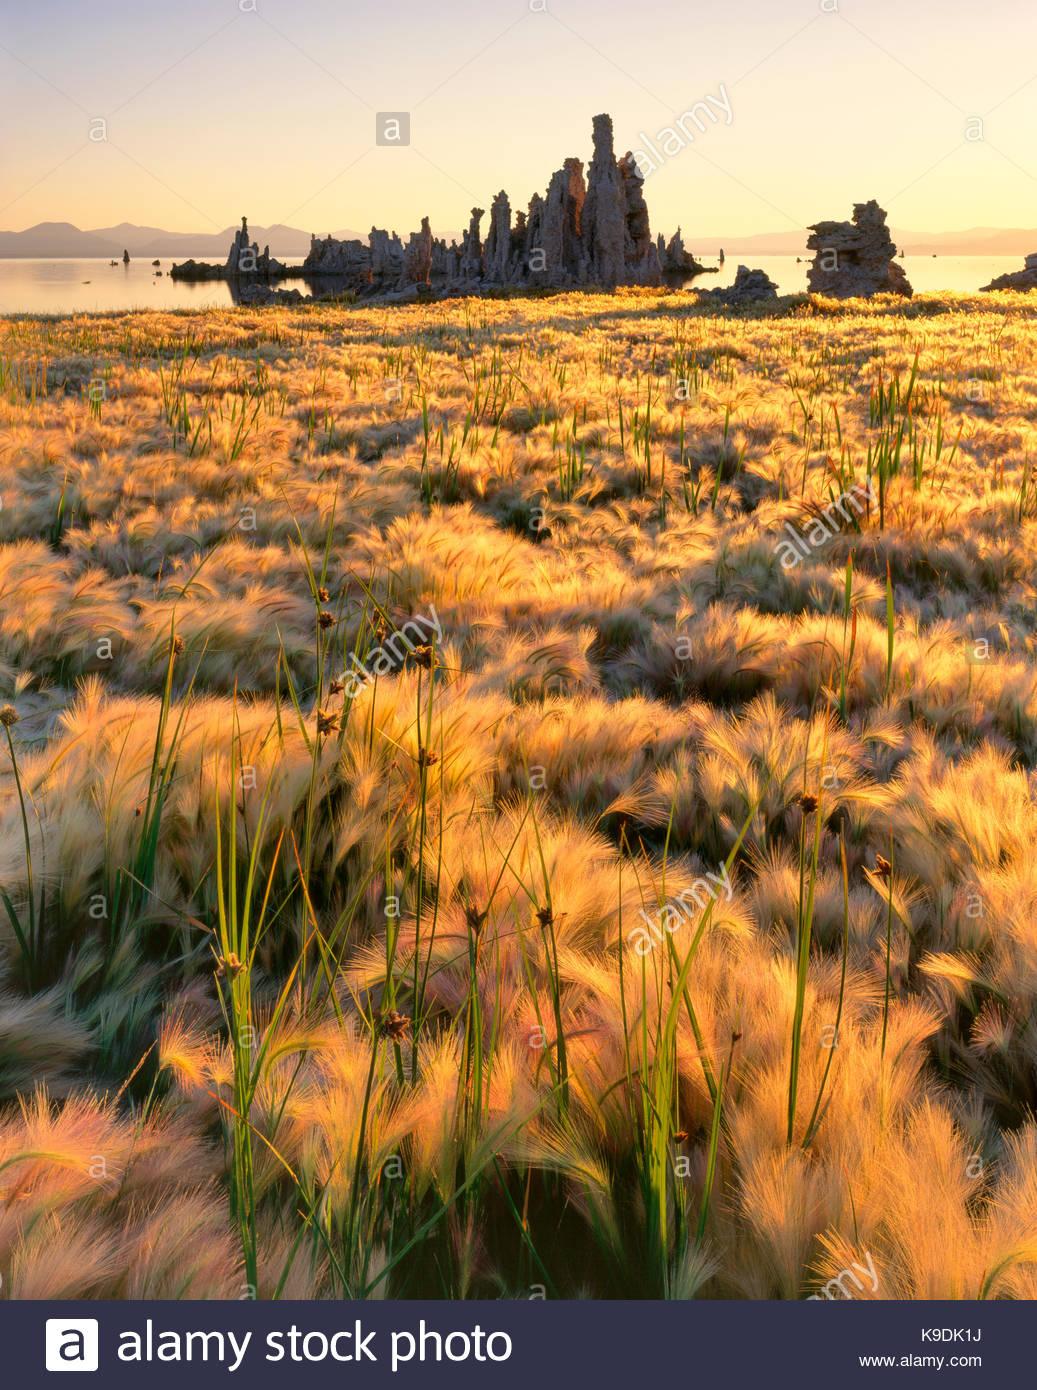 Wild Barley and Tufa Formations, Mono Lake, Mono Basin National Forest Scenic Area, California - Stock Image